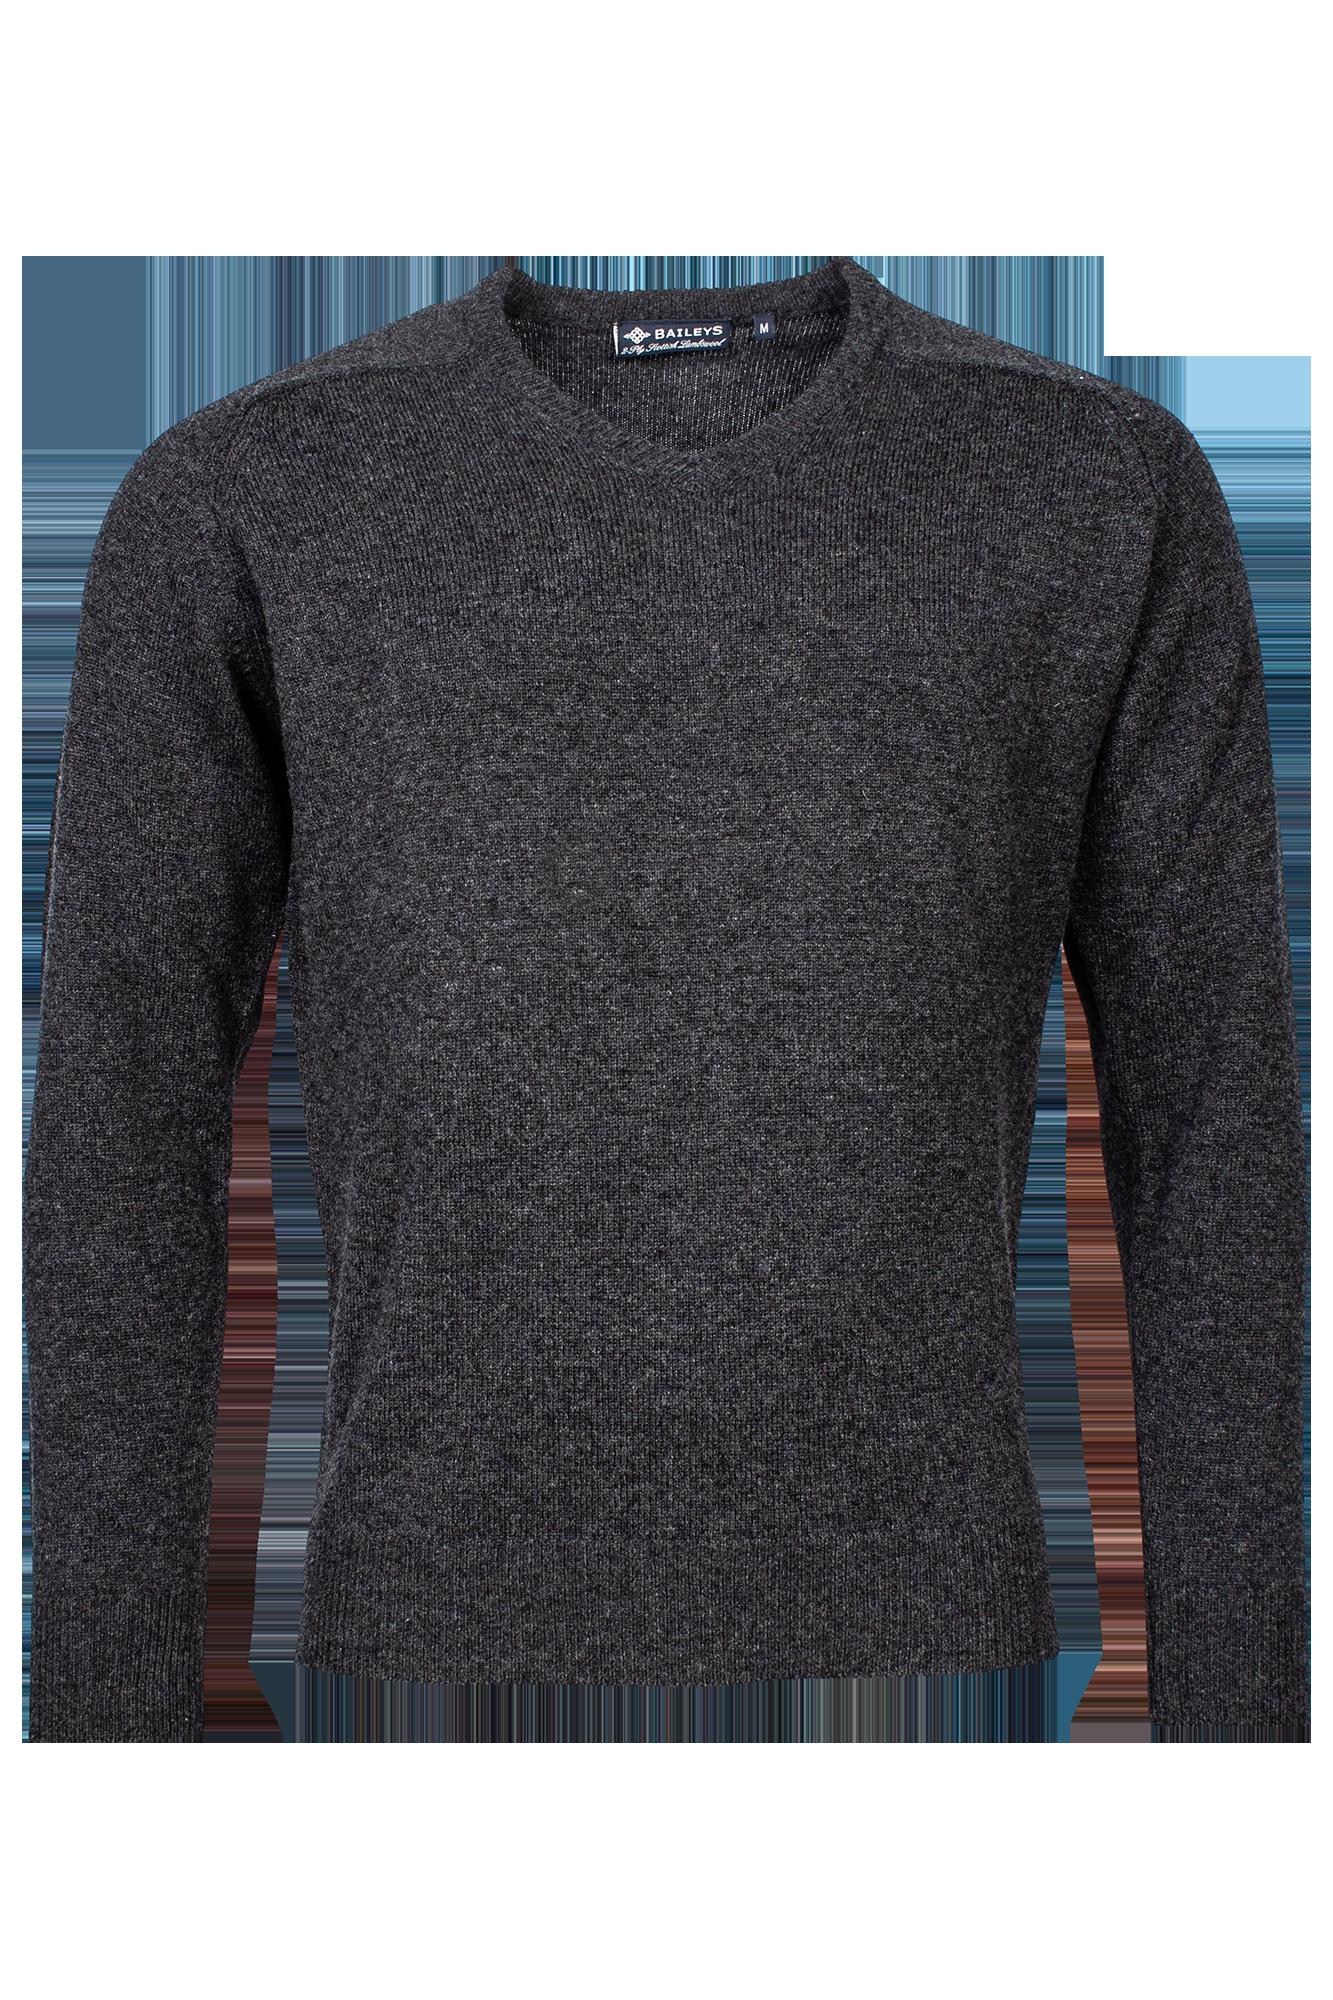 Baileys lamswollen pullover, v-hals, antraciet